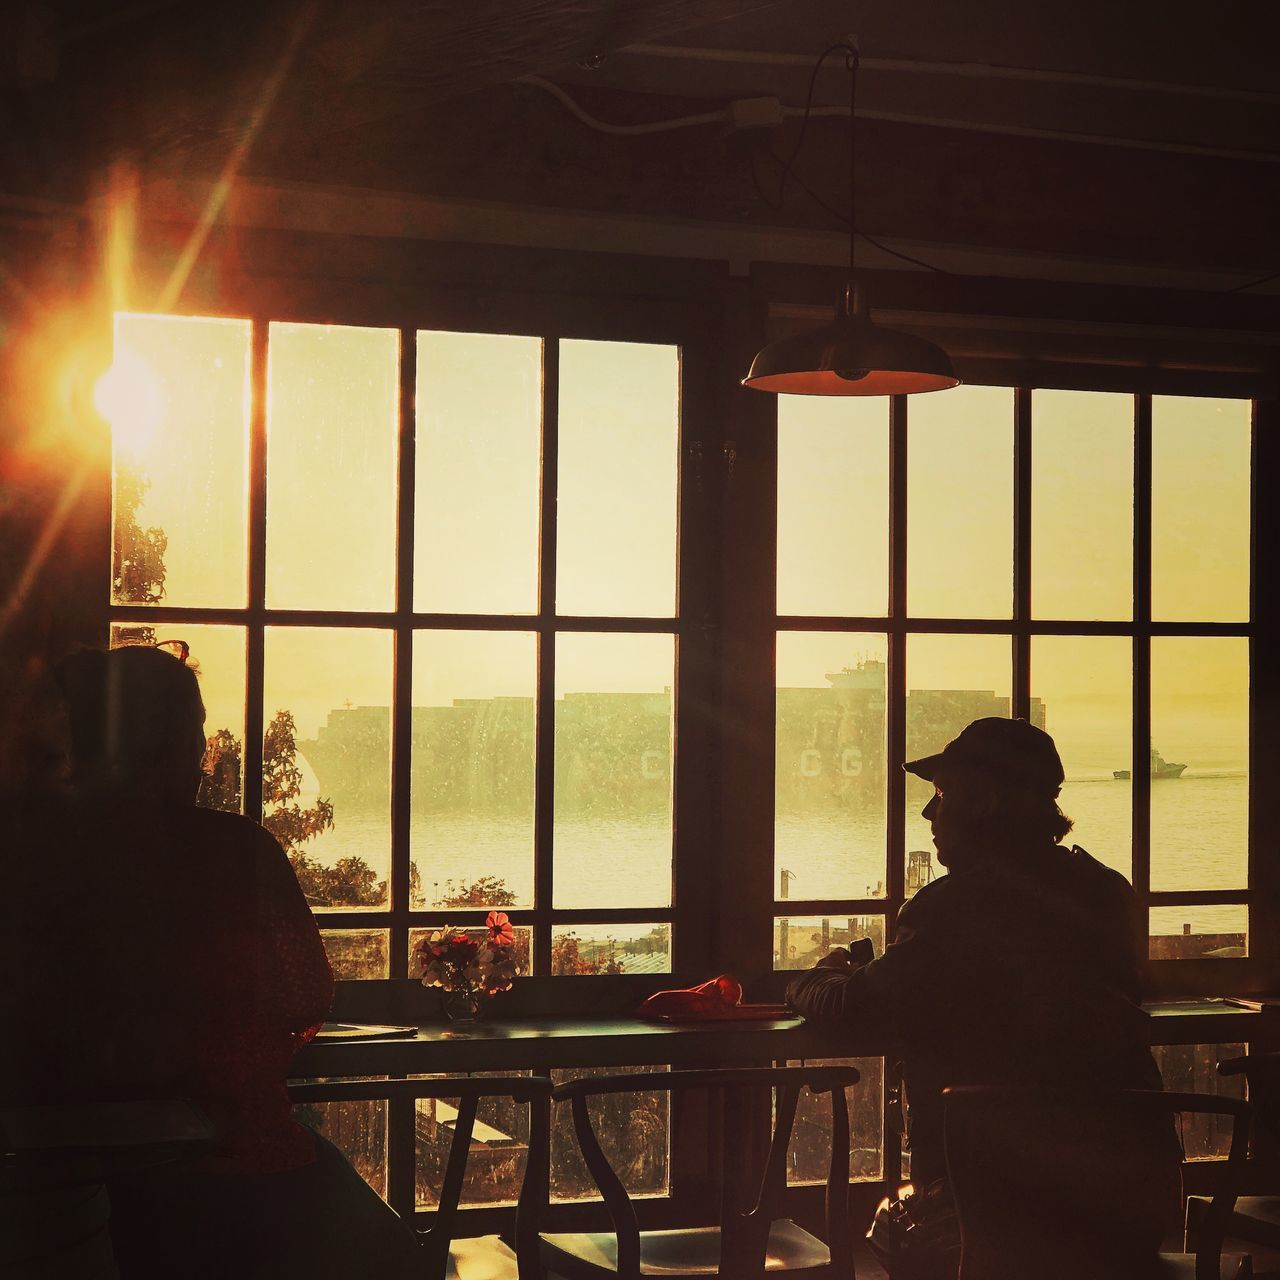 REAR VIEW OF SILHOUETTE MAN BY WINDOW